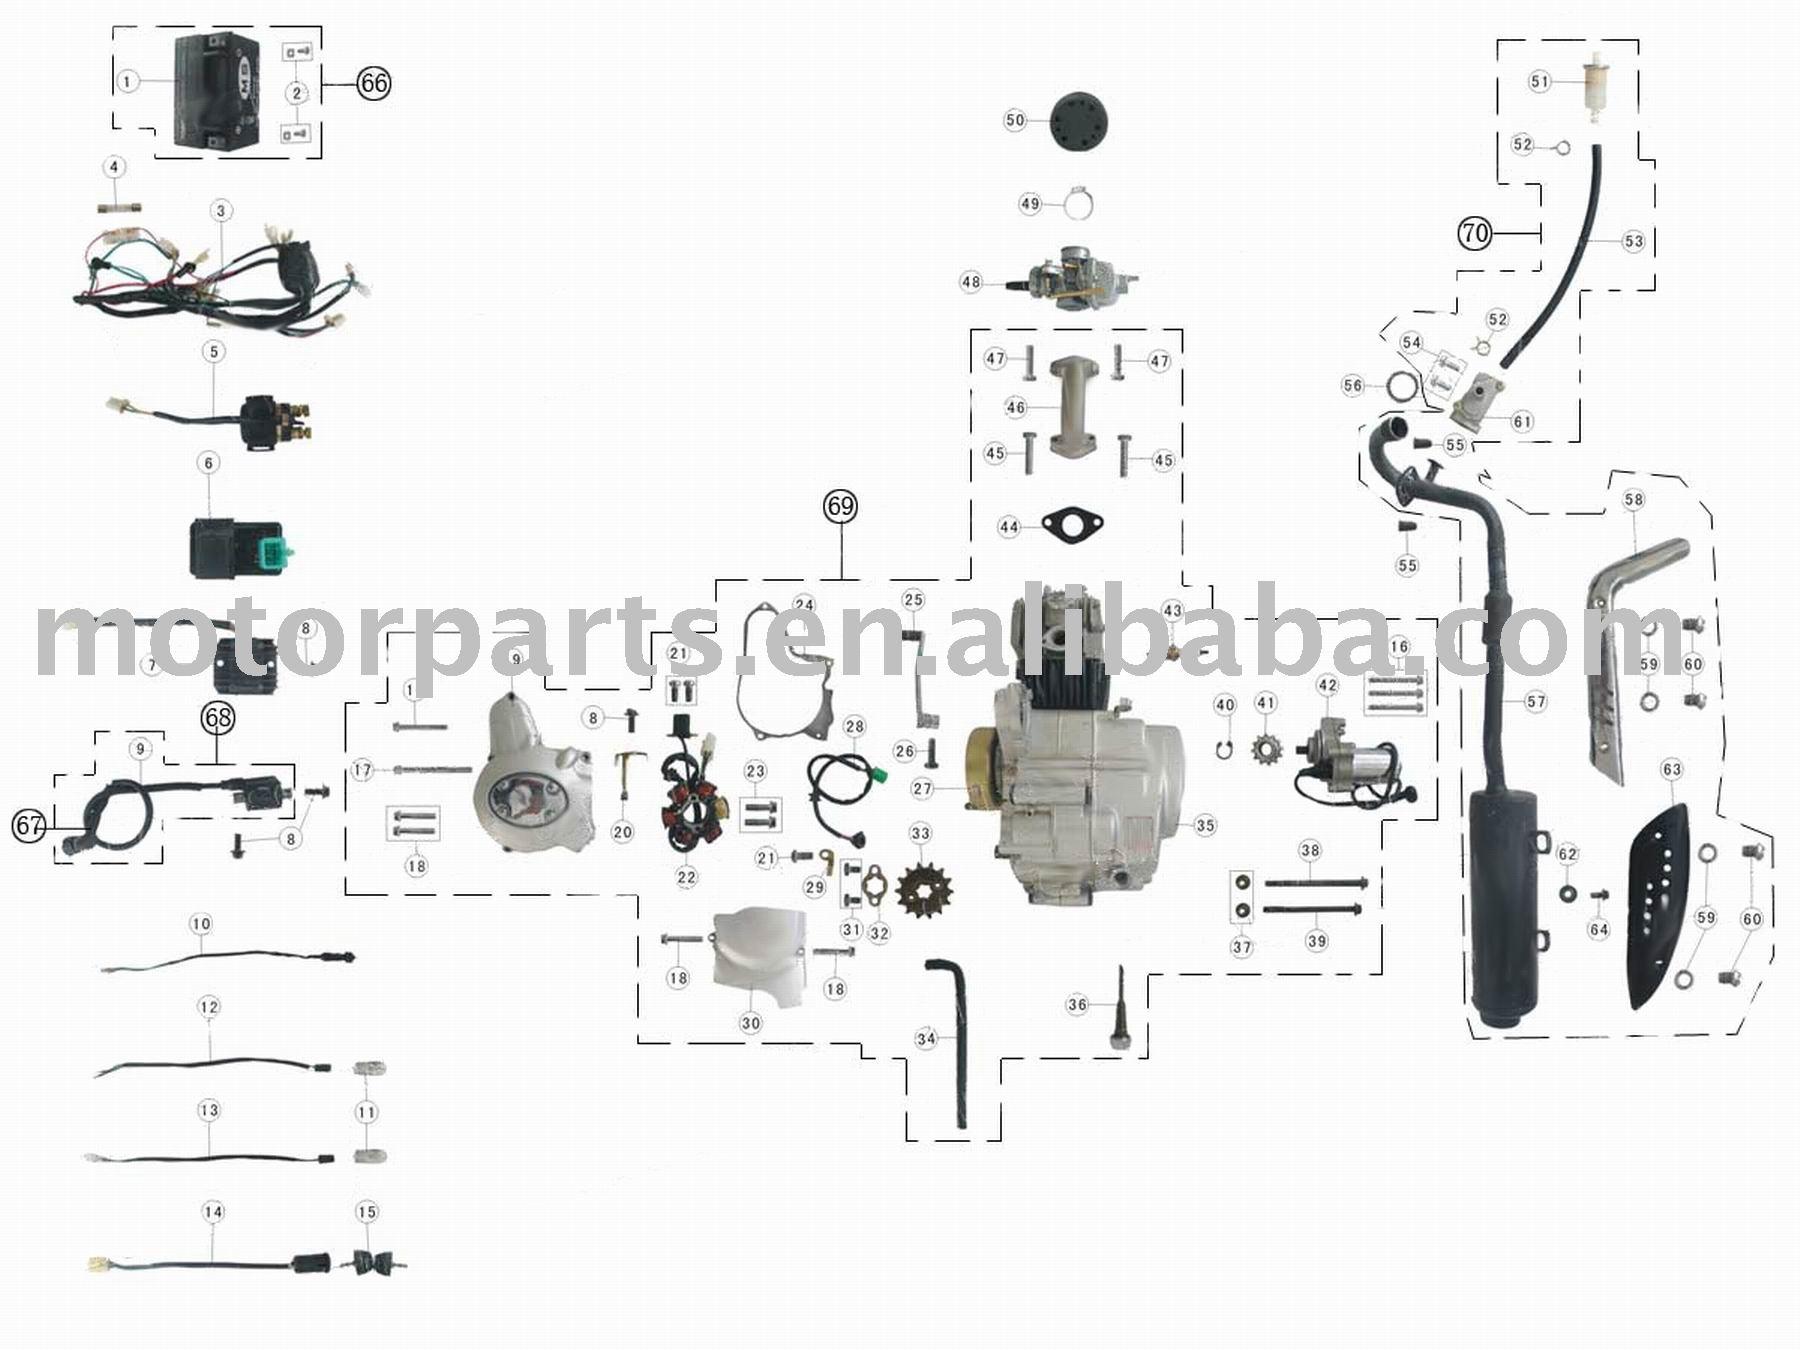 honda tmx wiring diagram honda rv ac wiring w 3 acs piaa wiring, Wiring diagram